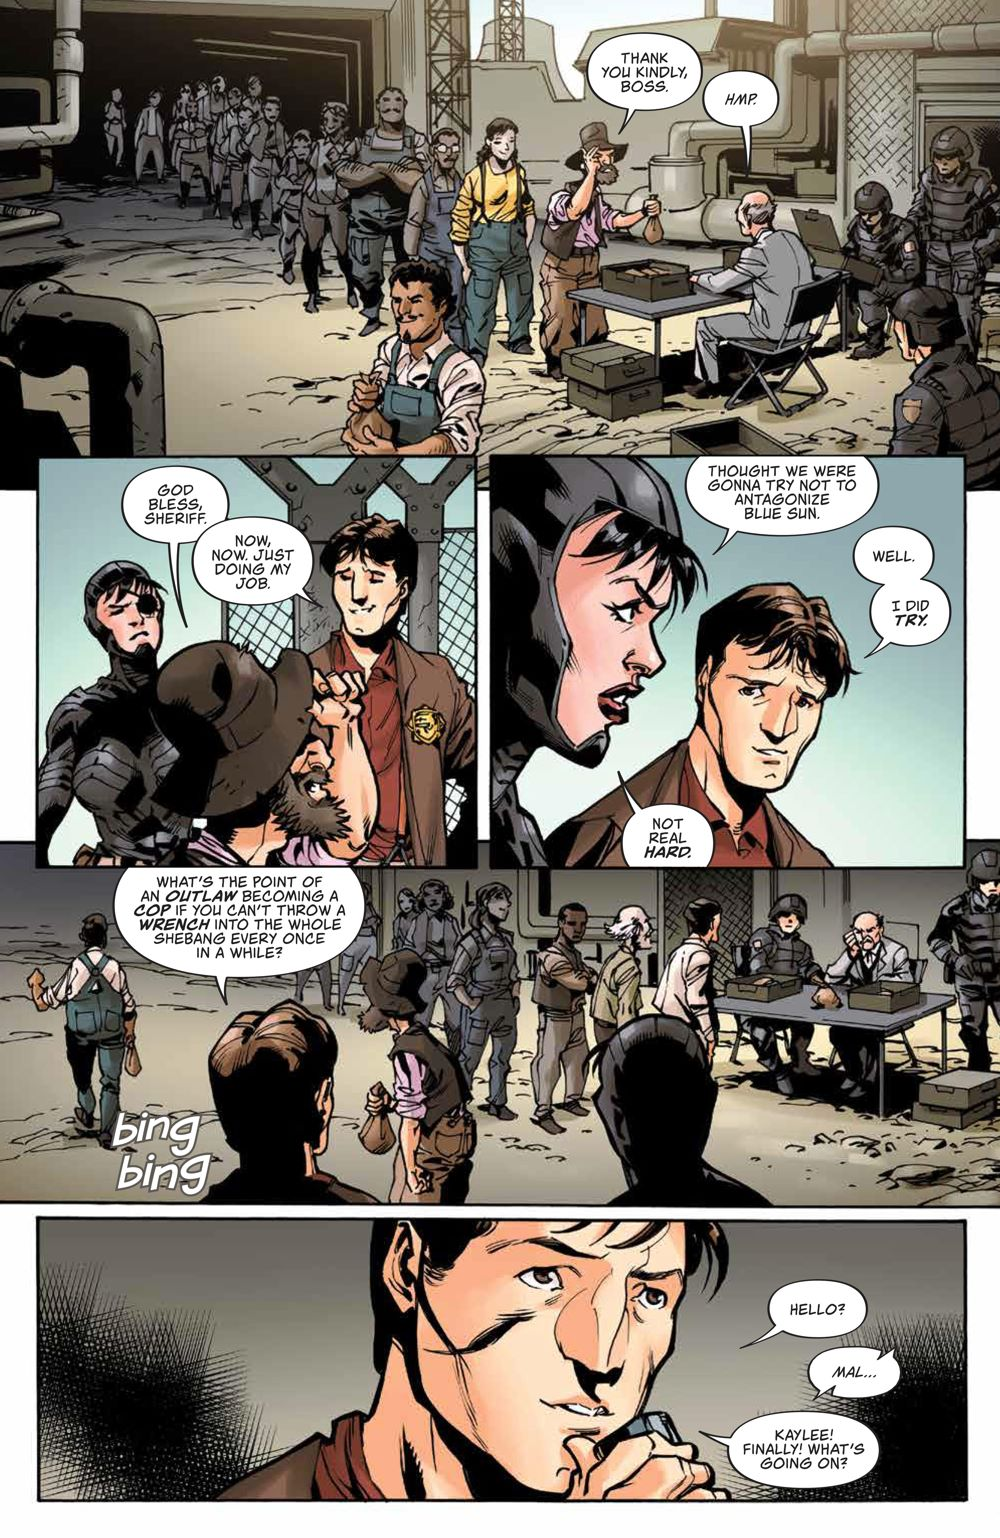 Firefly_NewSheriffVerse_v2_HC_PRESS_19 ComicList Previews: FIREFLY NEW SHERIFF IN THE 'VERSE VOLUME 2 HC